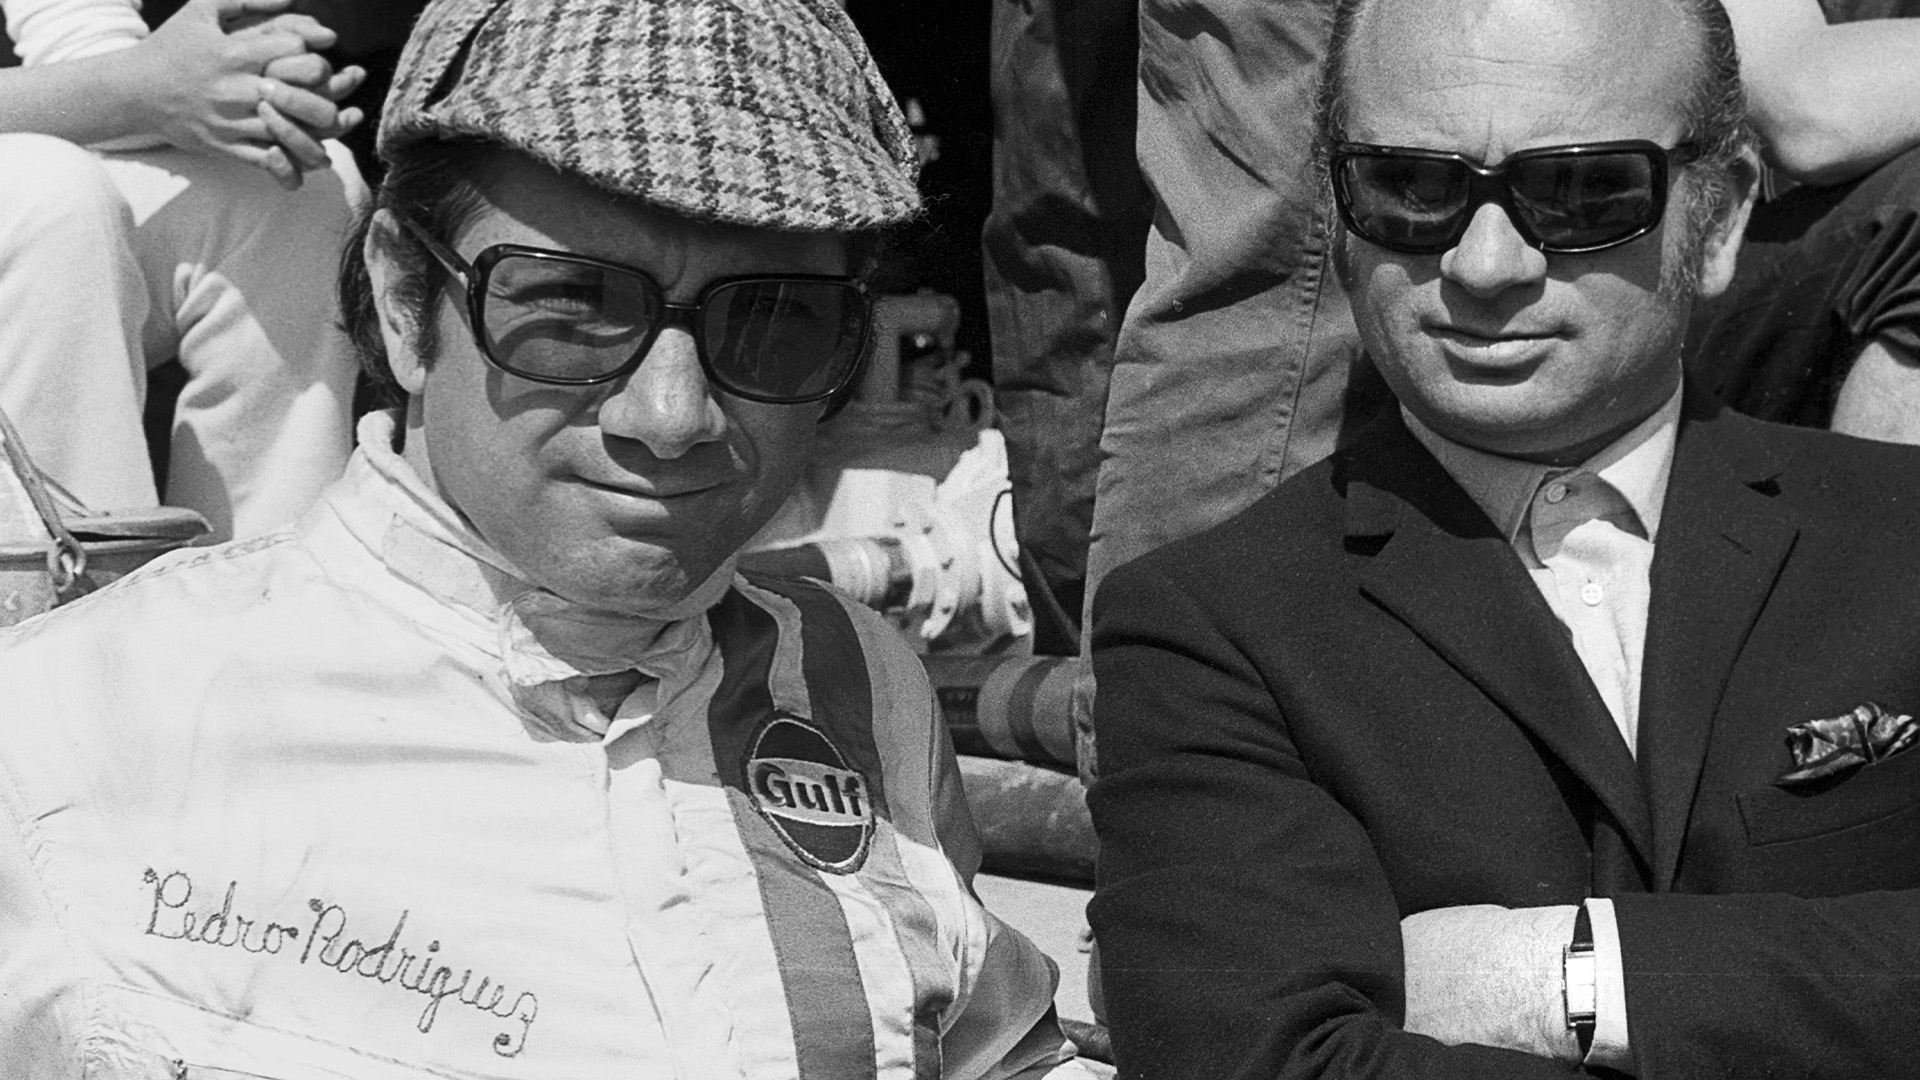 Pedro Rodriguez at the Targa Florio in 1970